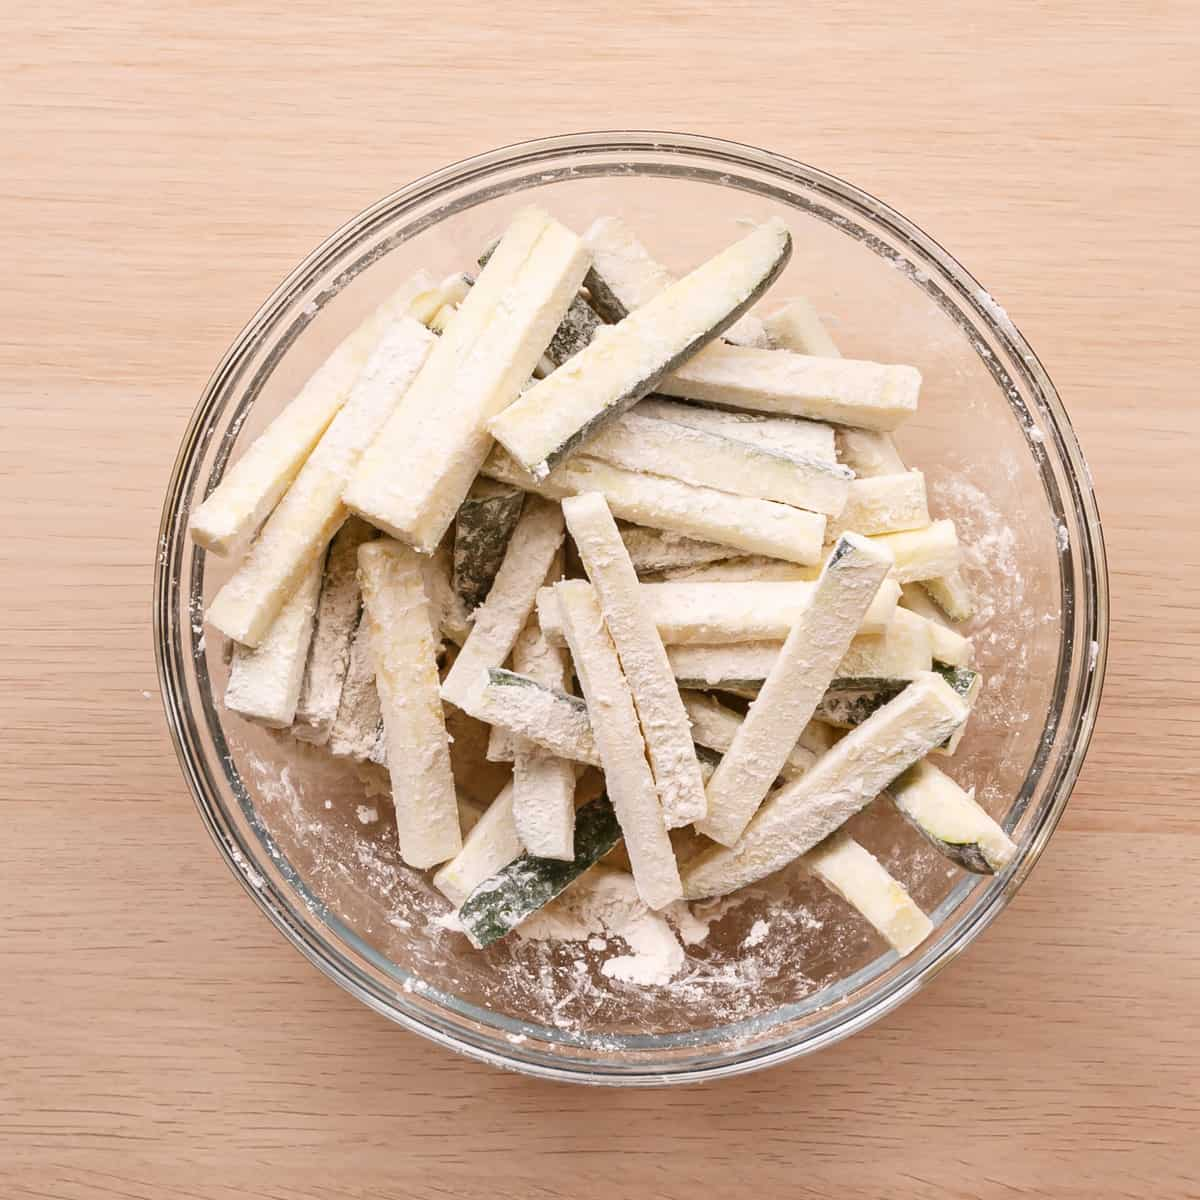 battered zucchini fries